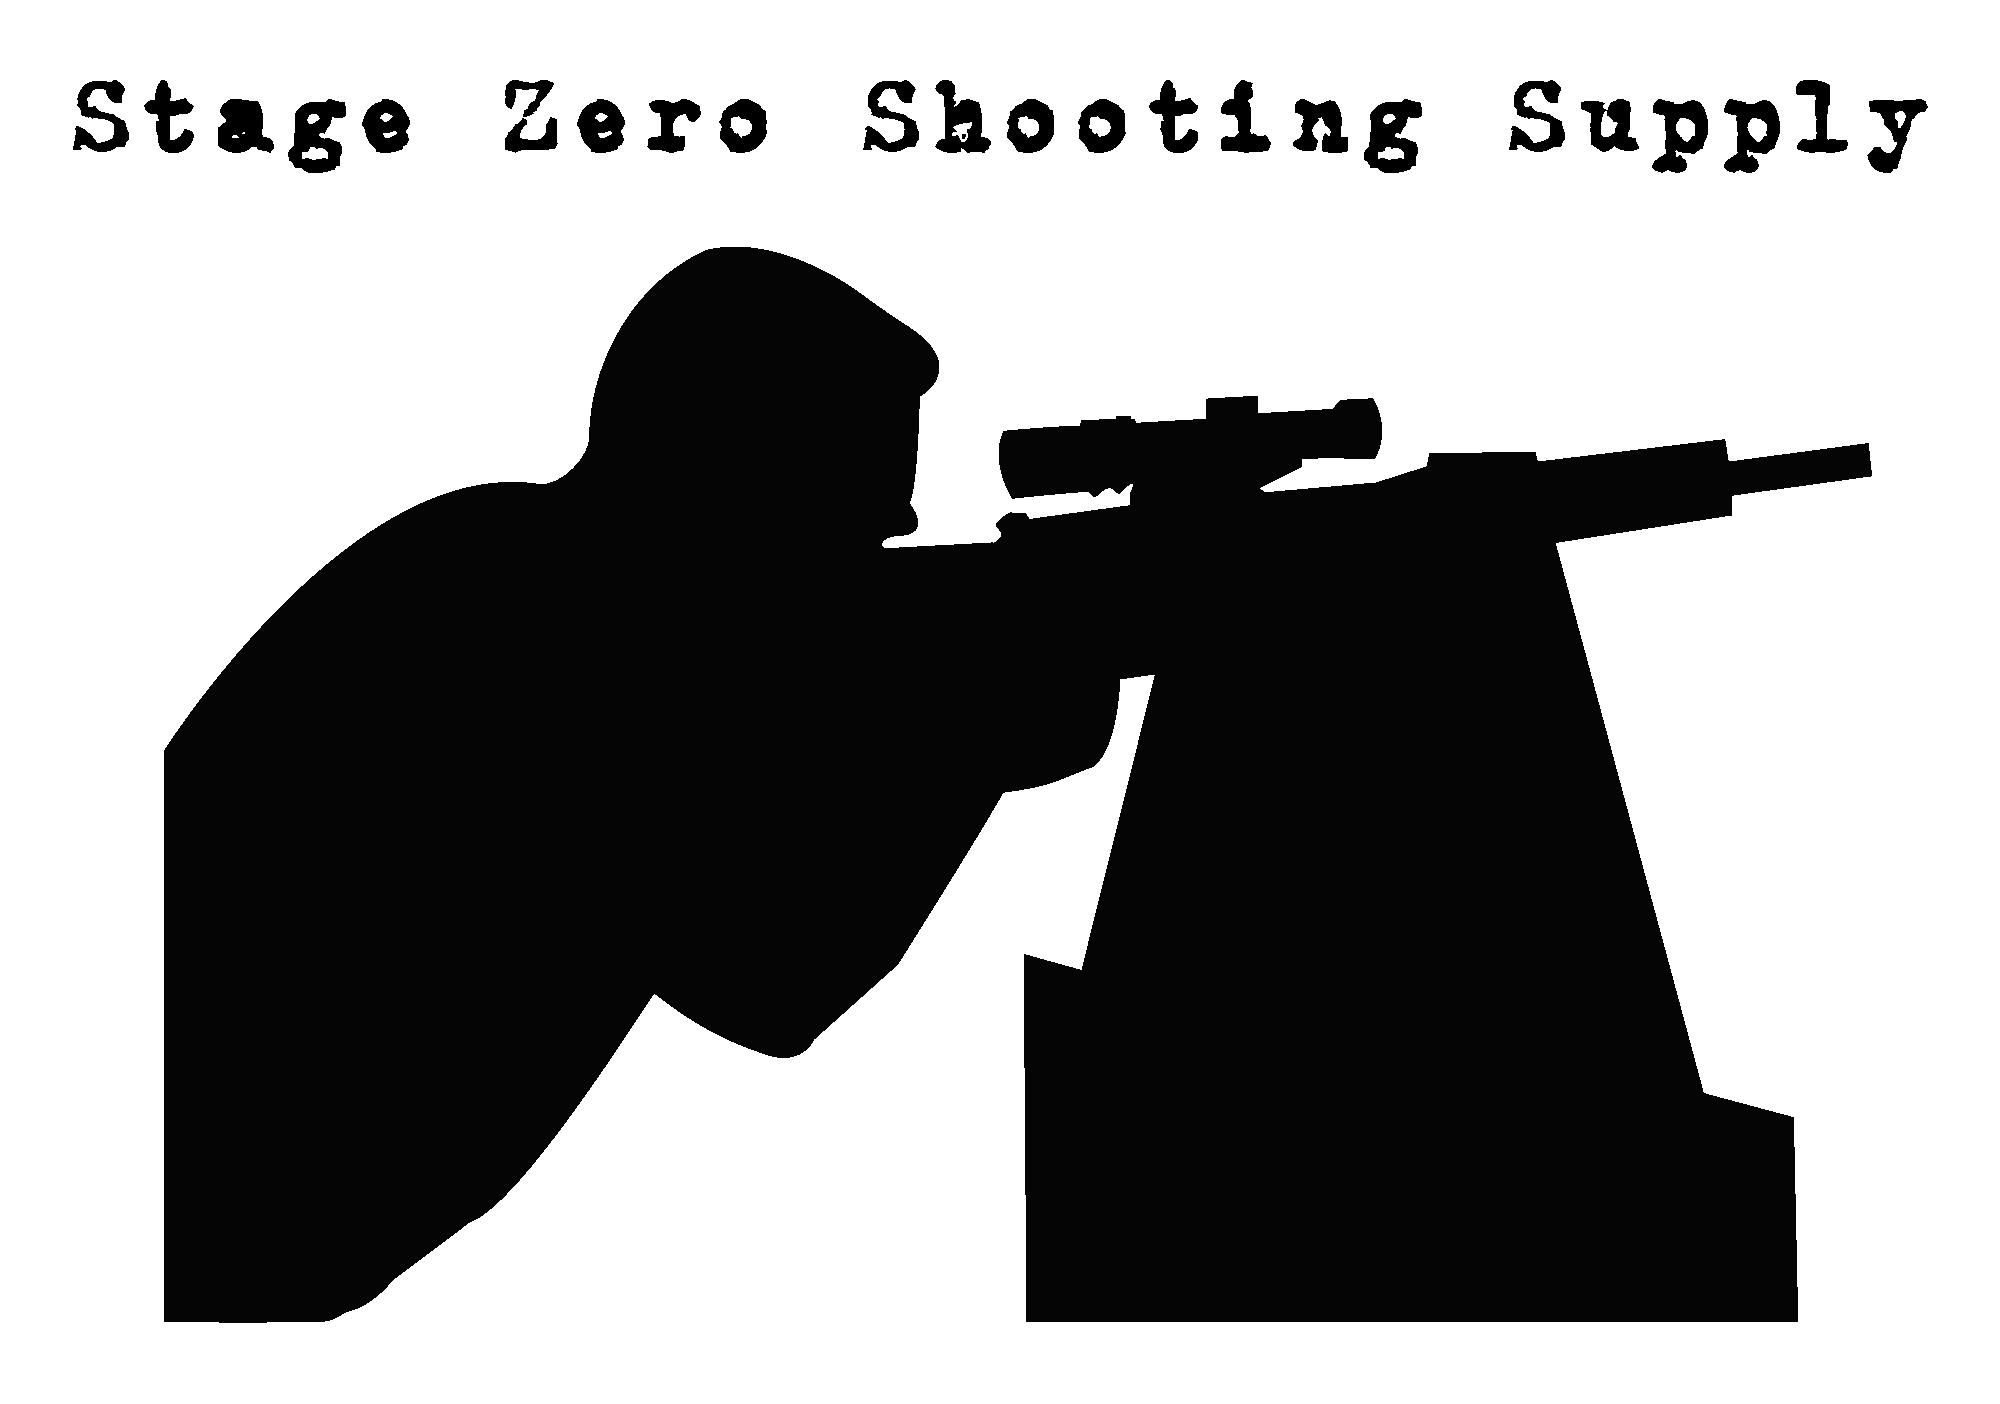 Stage Zero Shooting Supply